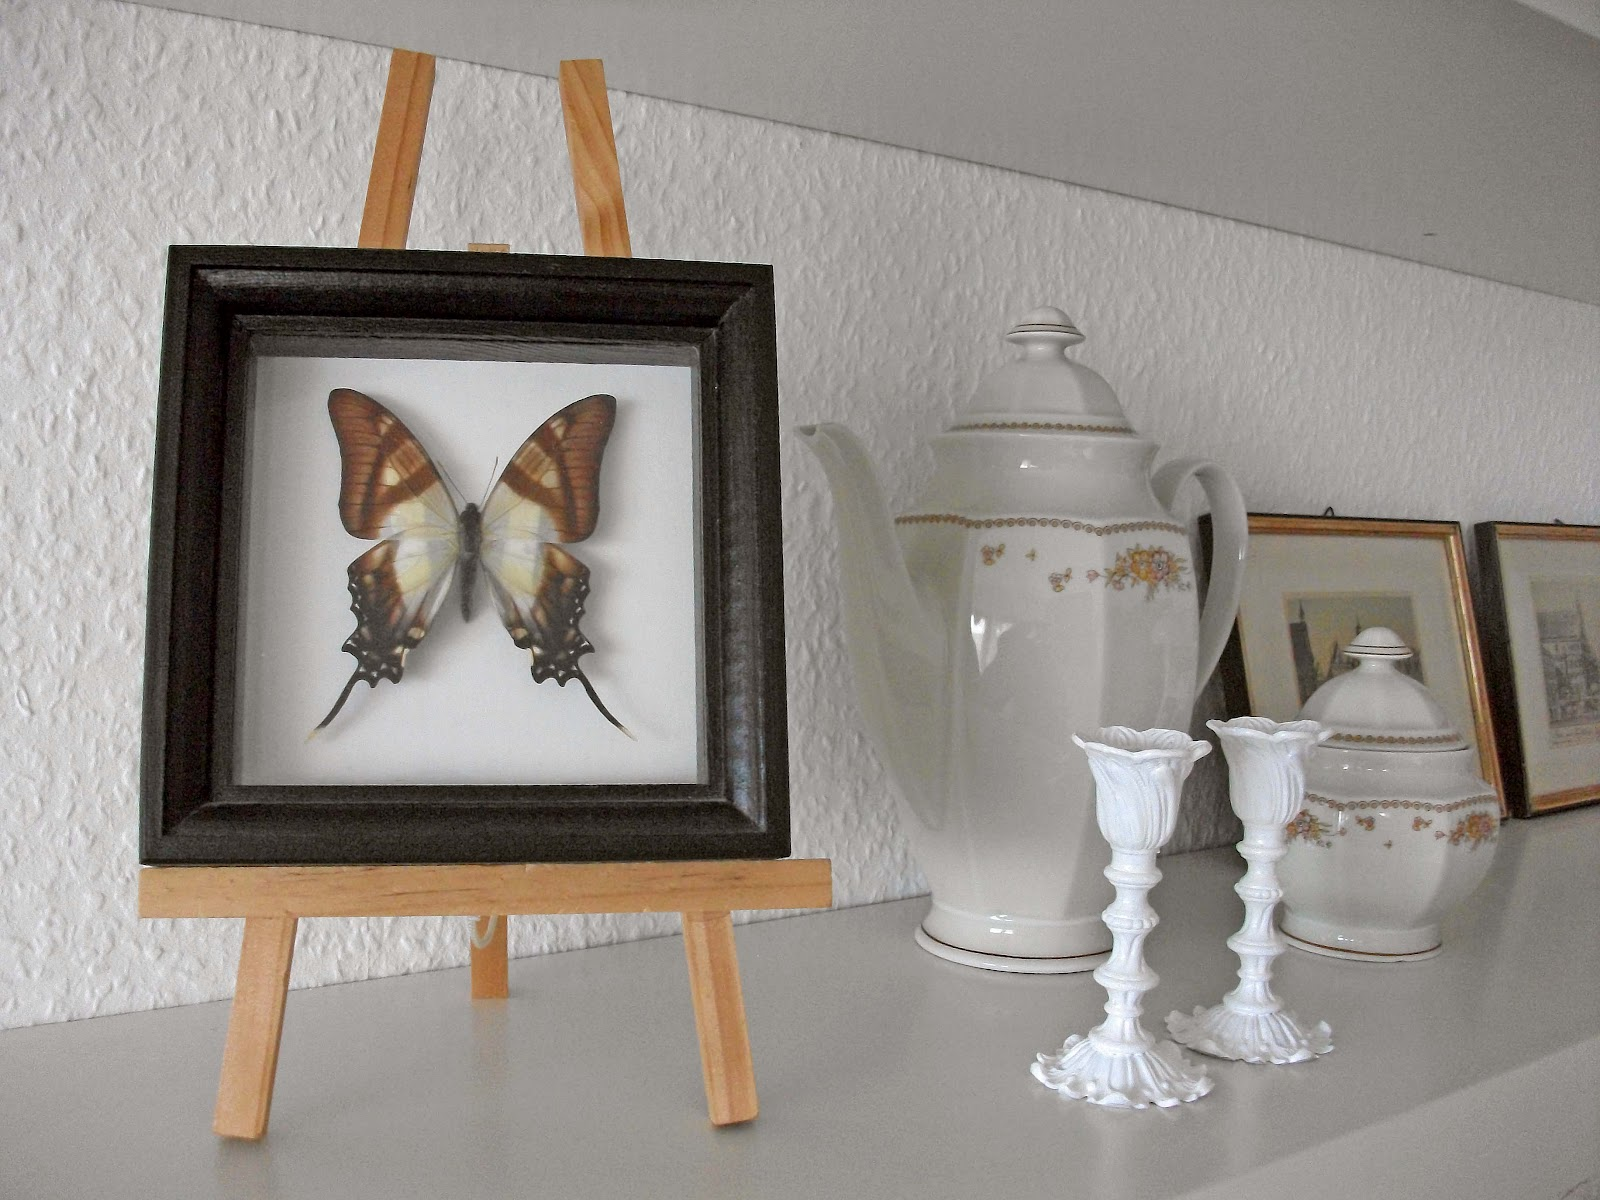 schilli fashion handmade kreative w nde. Black Bedroom Furniture Sets. Home Design Ideas